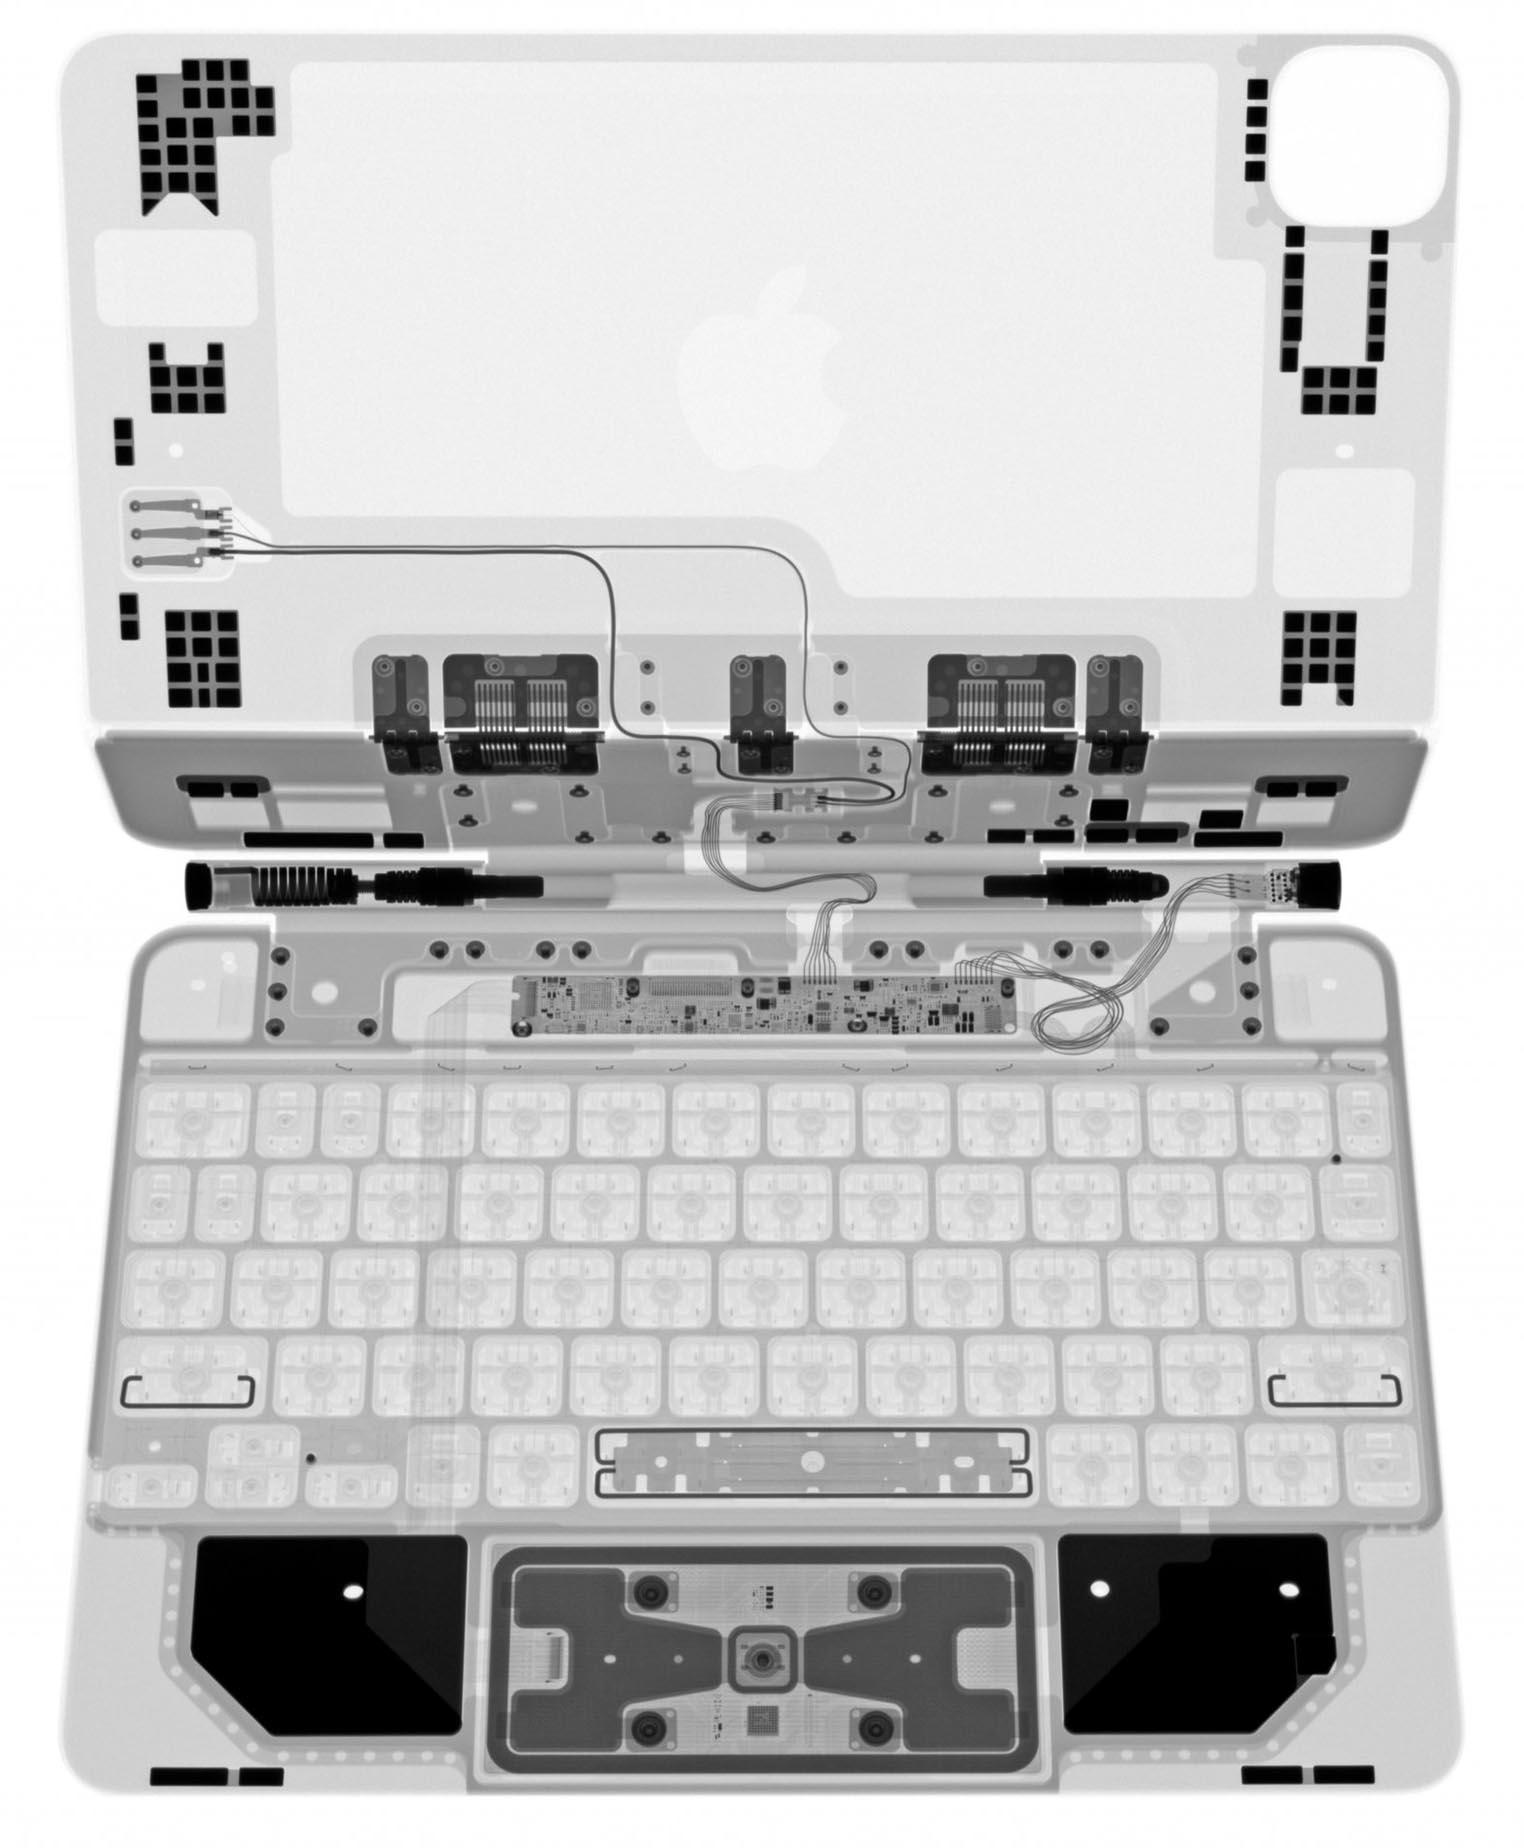 Magic Keyboard iPad Pro Rayons X